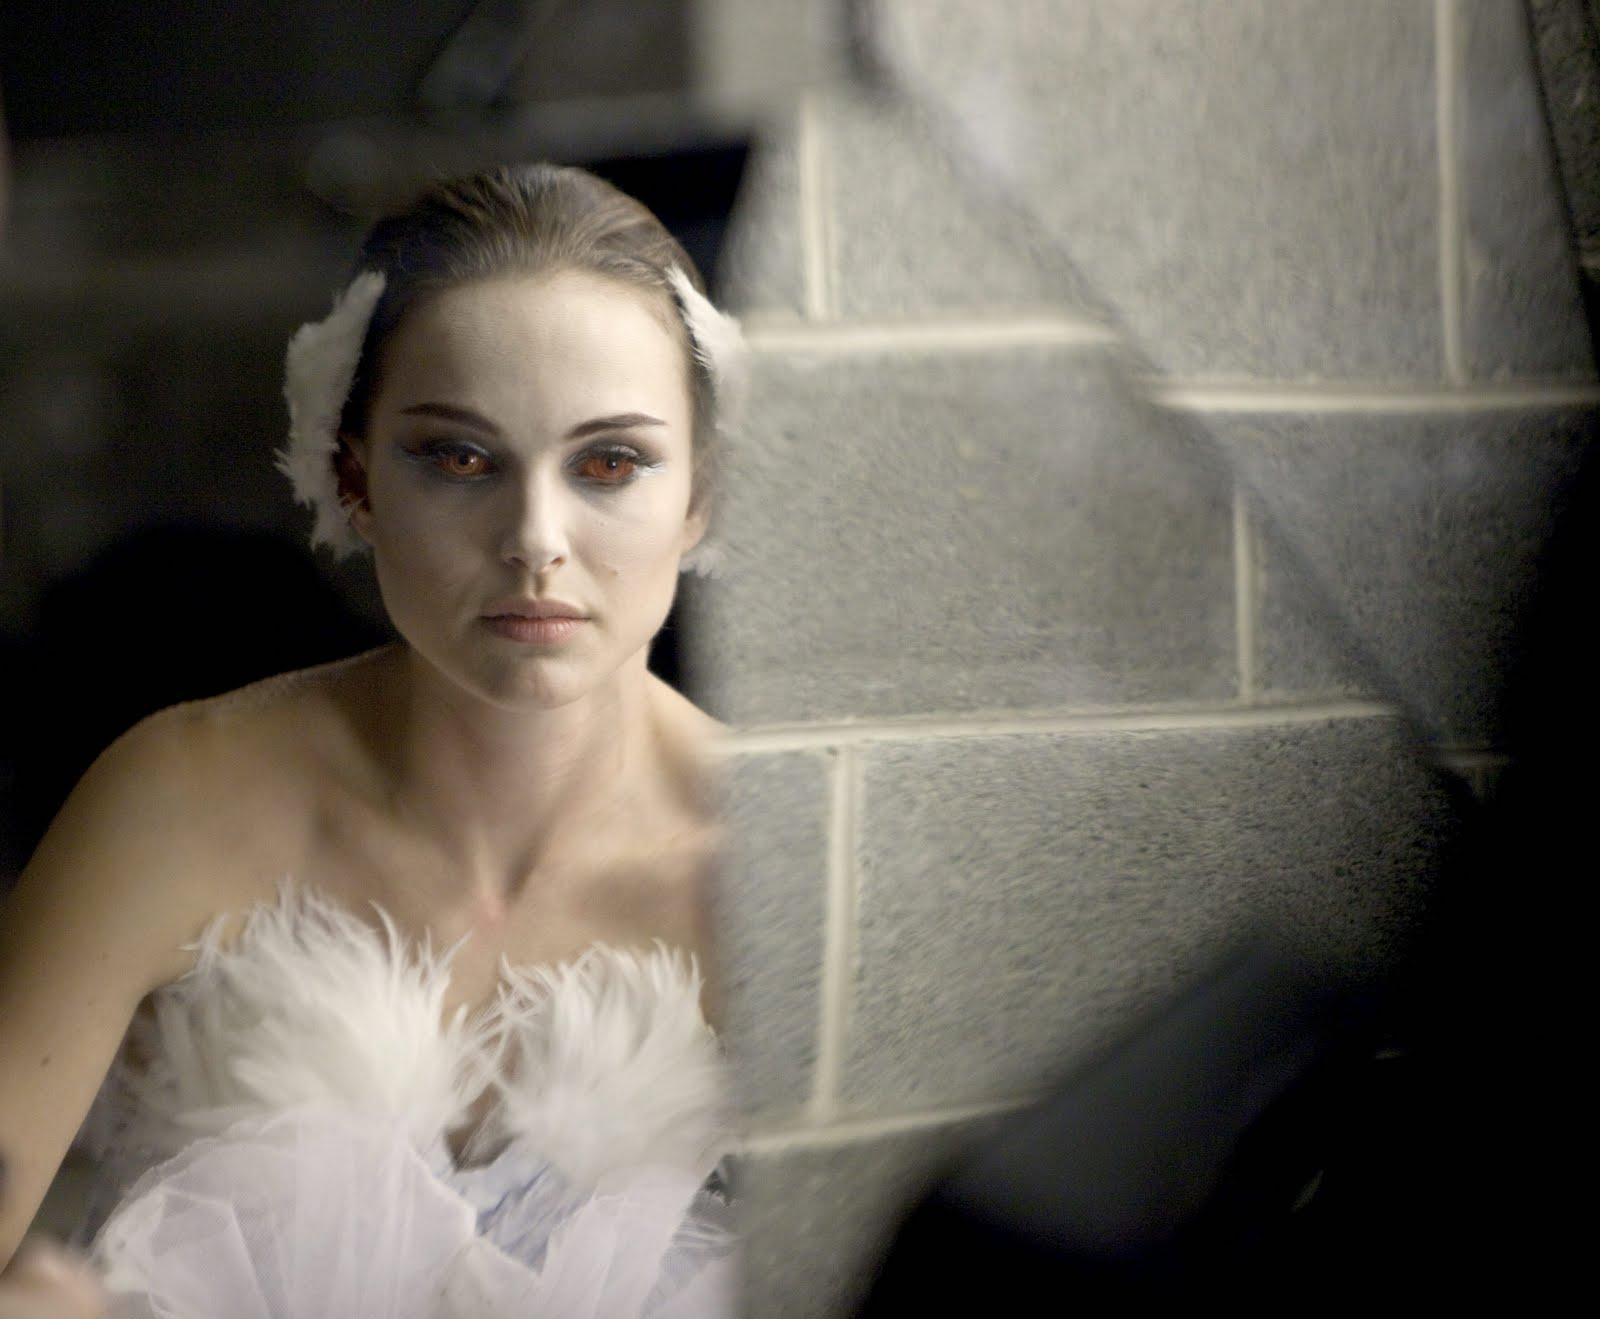 http://1.bp.blogspot.com/-y7Z2r1cTebU/TkATnEwrbcI/AAAAAAAAAFo/BeLmaQ_srgs/s1600/Film+Review+Black+Swan.JP_3.jpg